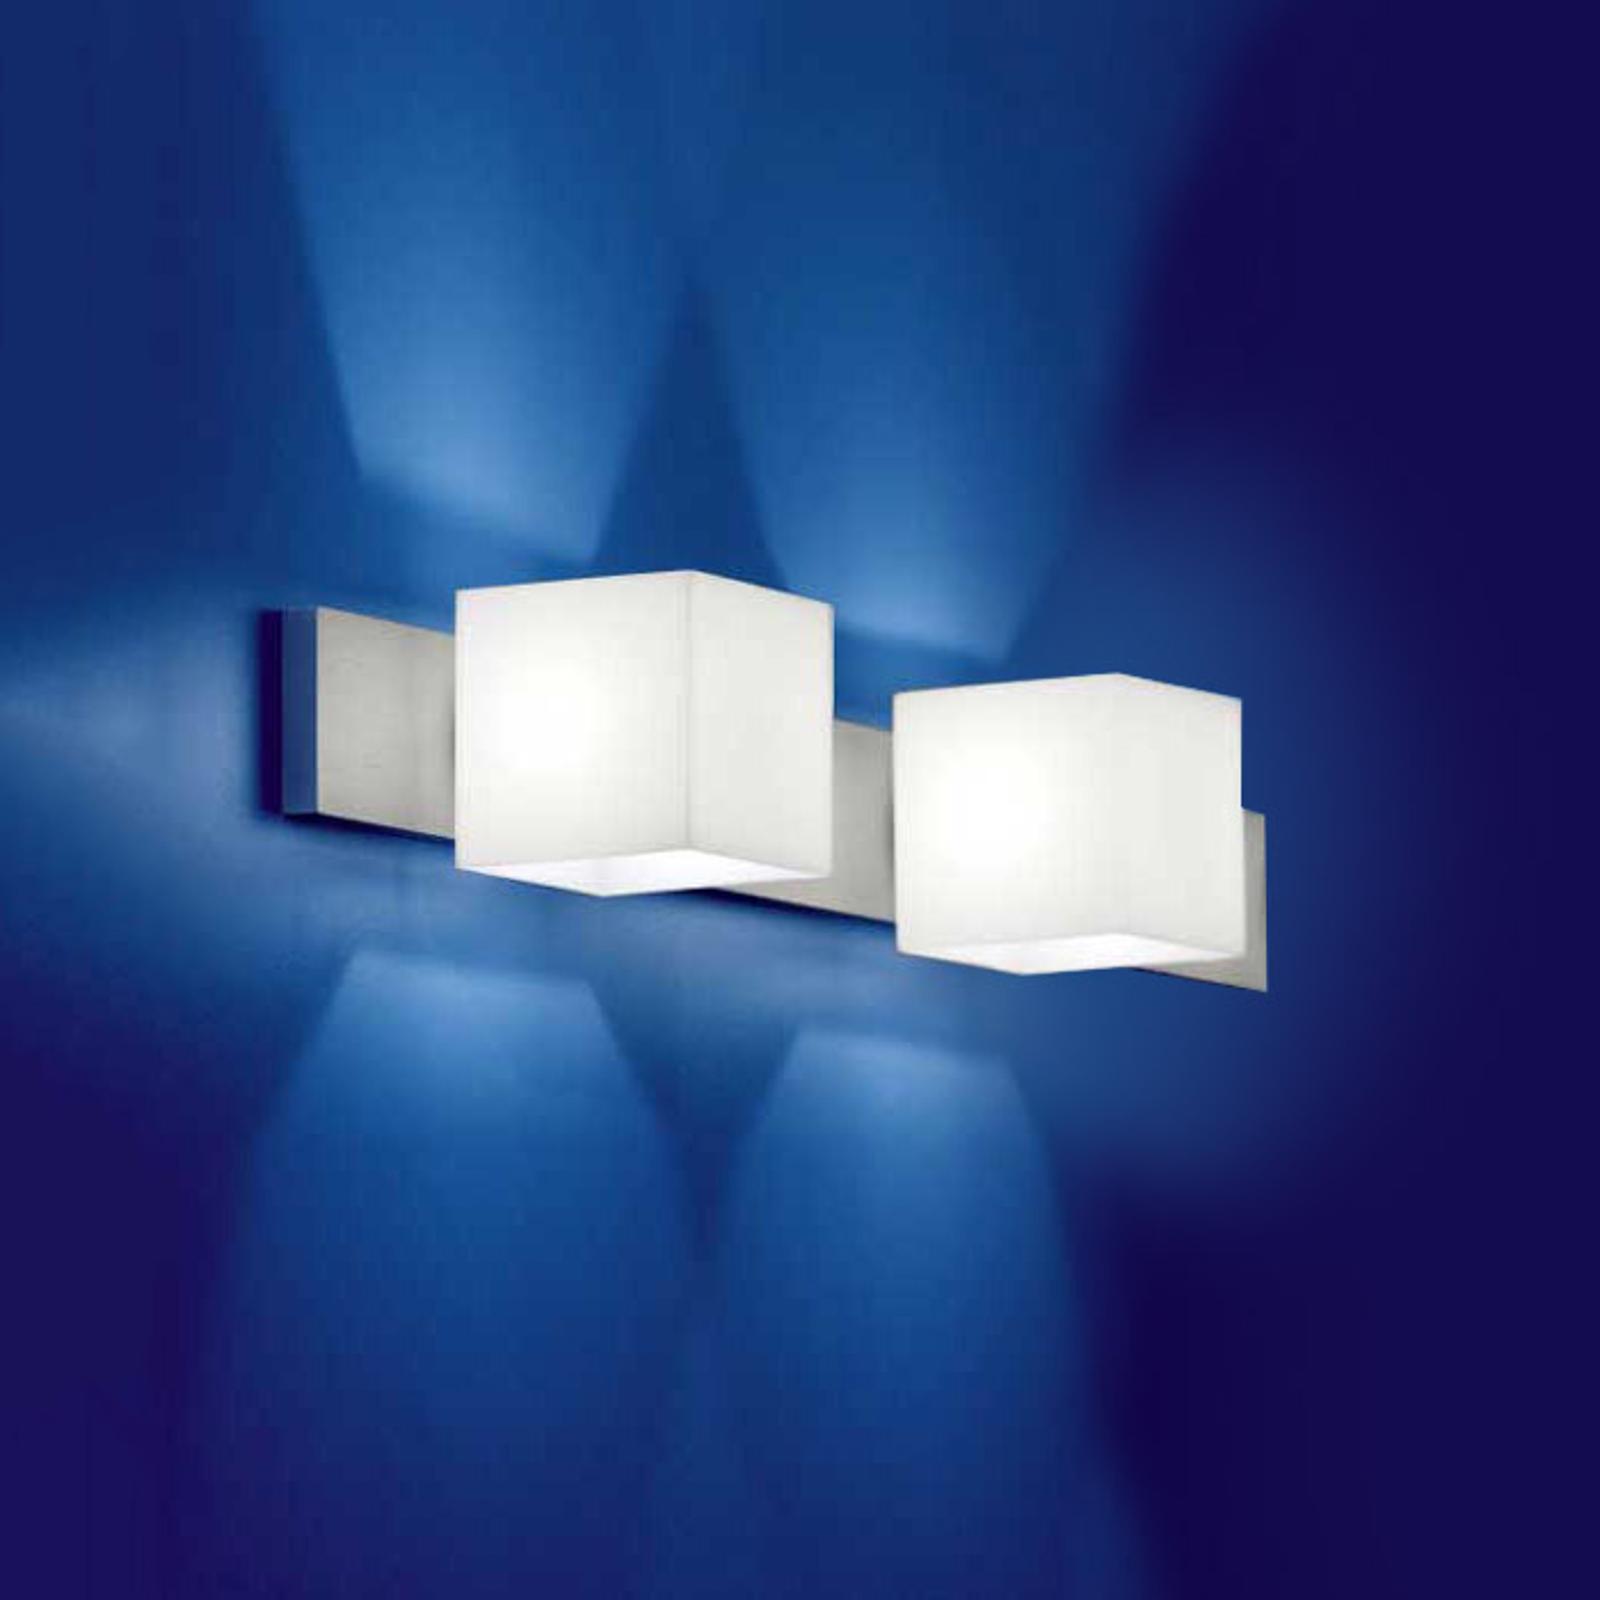 Vegglampe CUBE med blendingssylinder 2 lyskilder